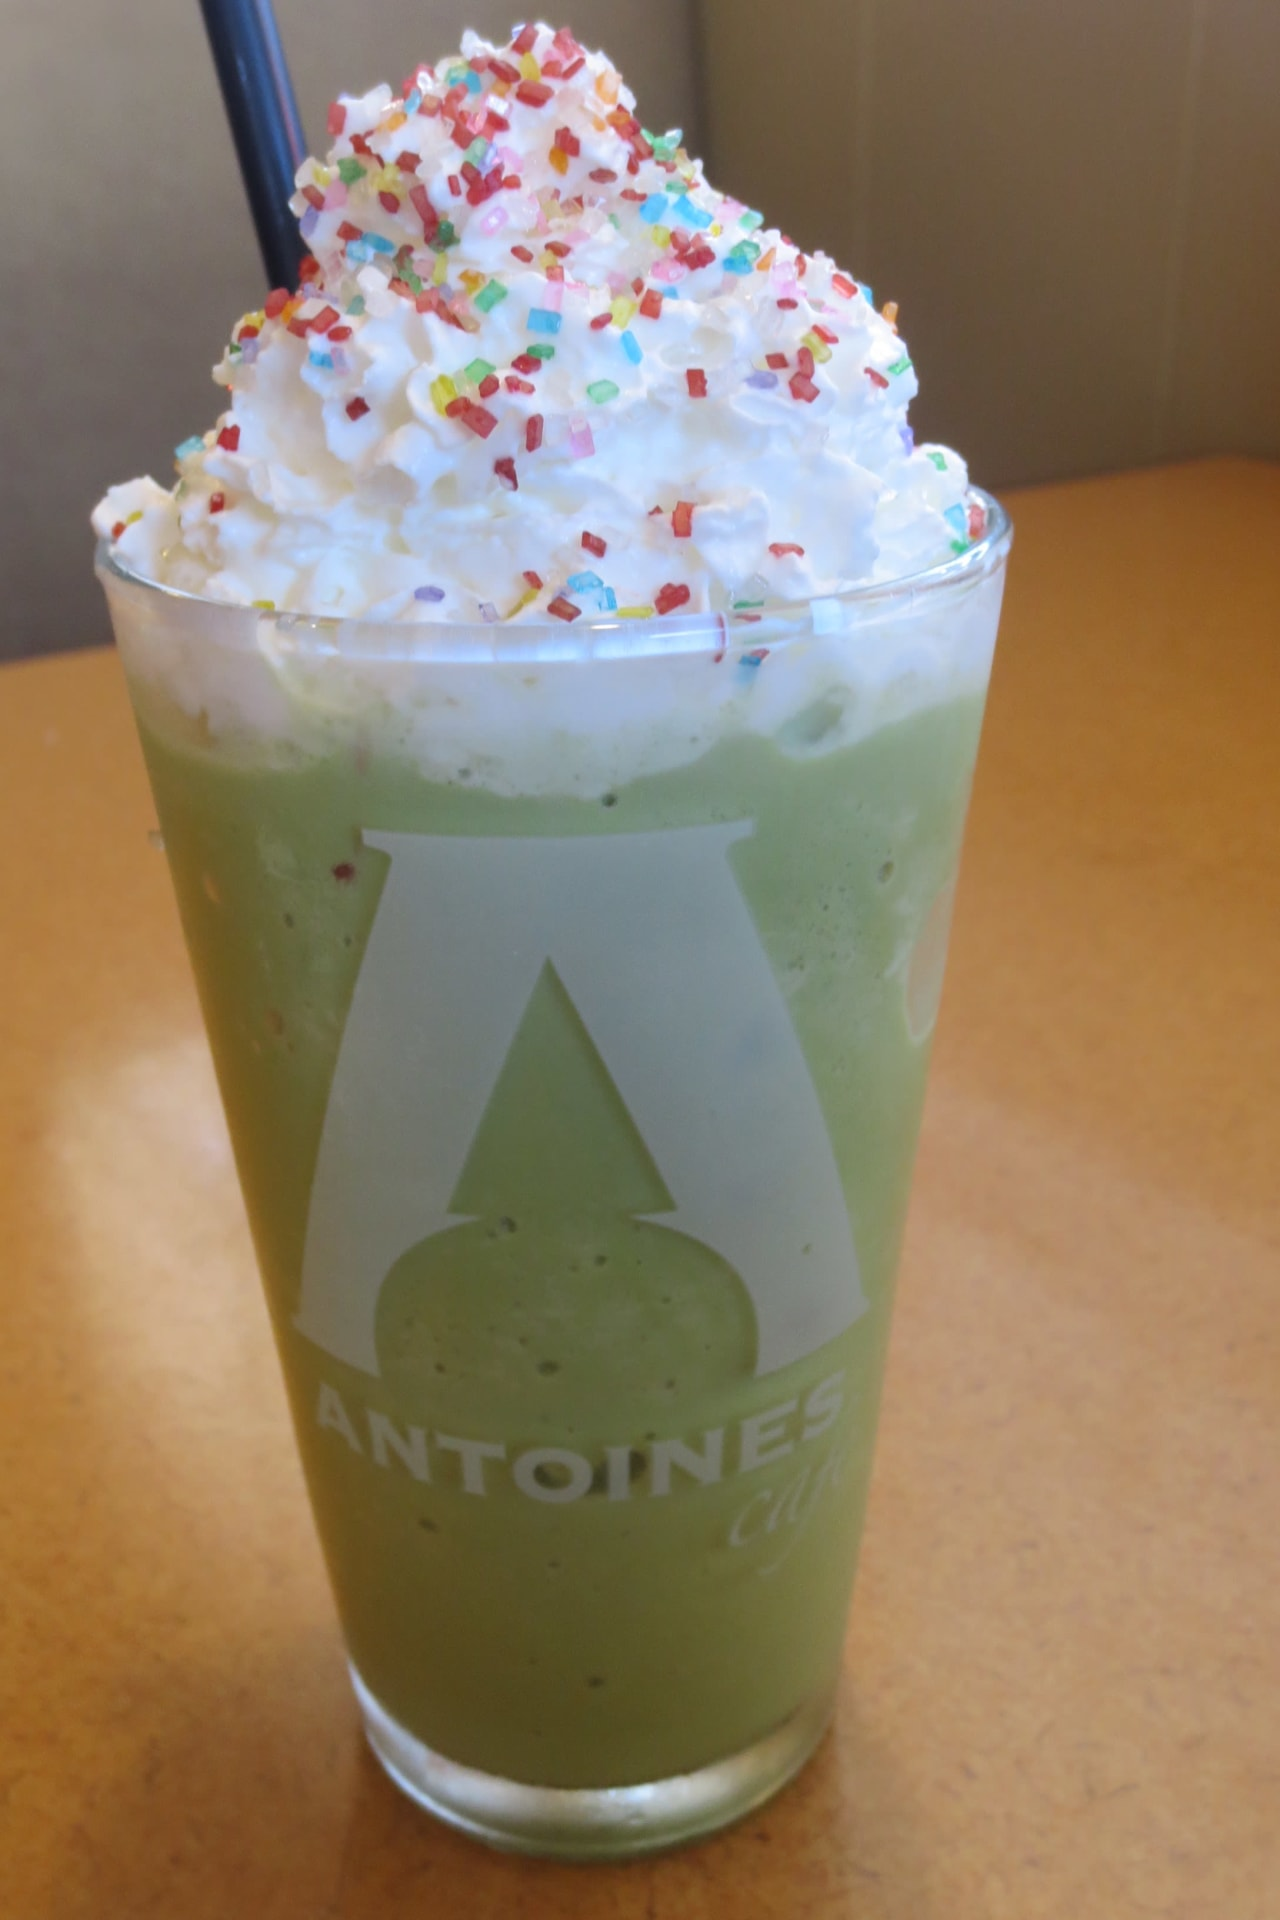 Blended Matcha Green Tea